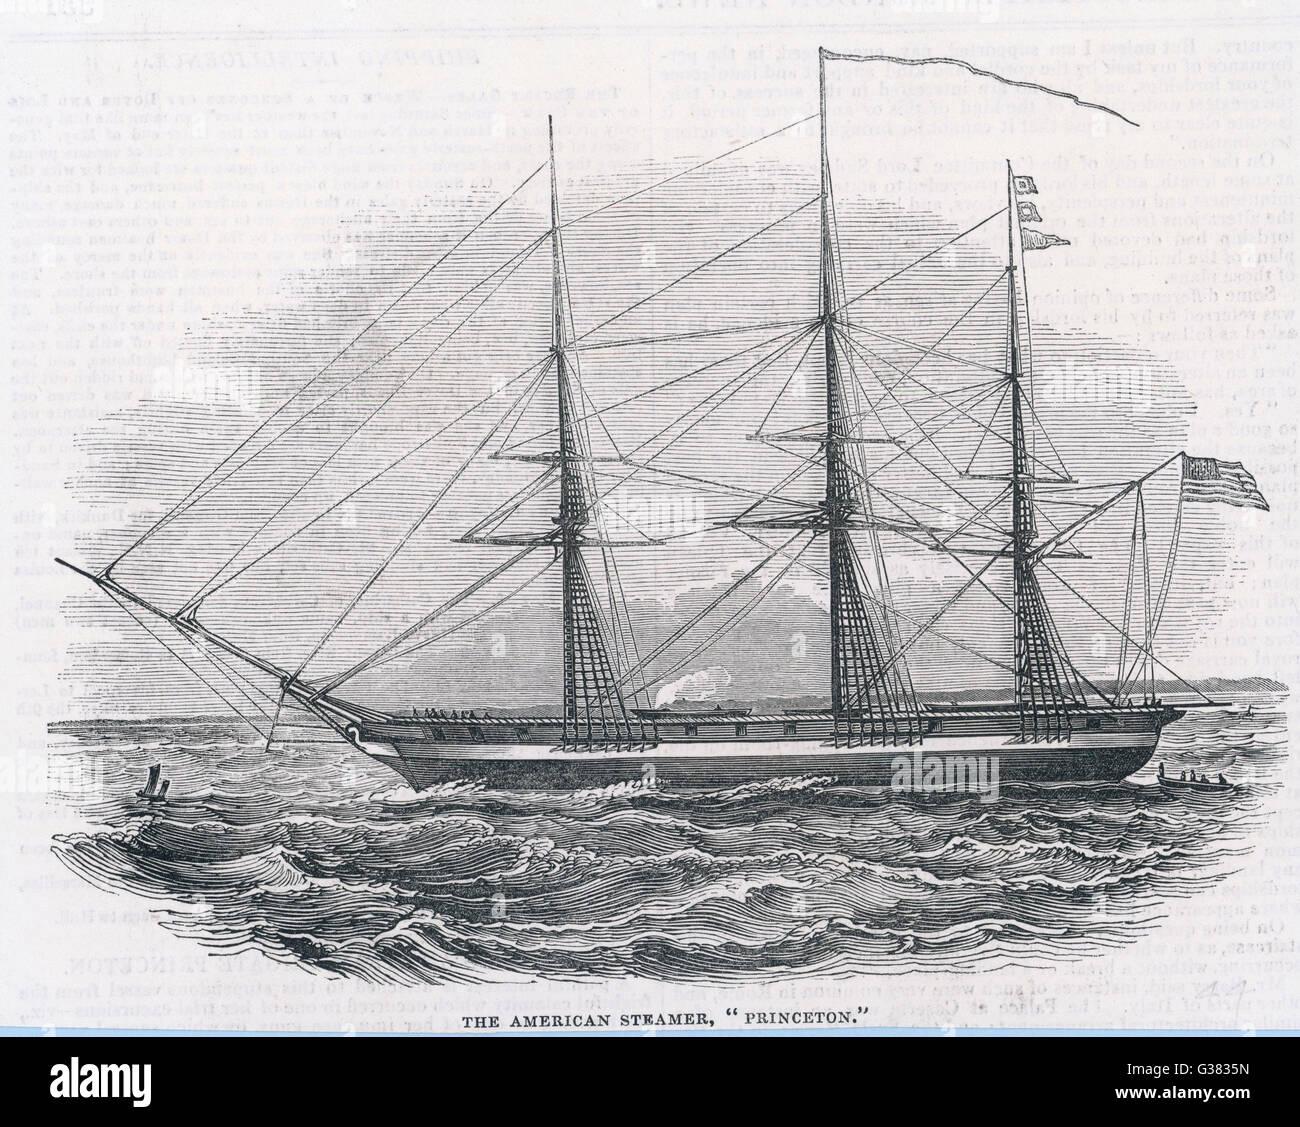 American propeller-driven  steam frigate         Date: 1844 - Stock Image